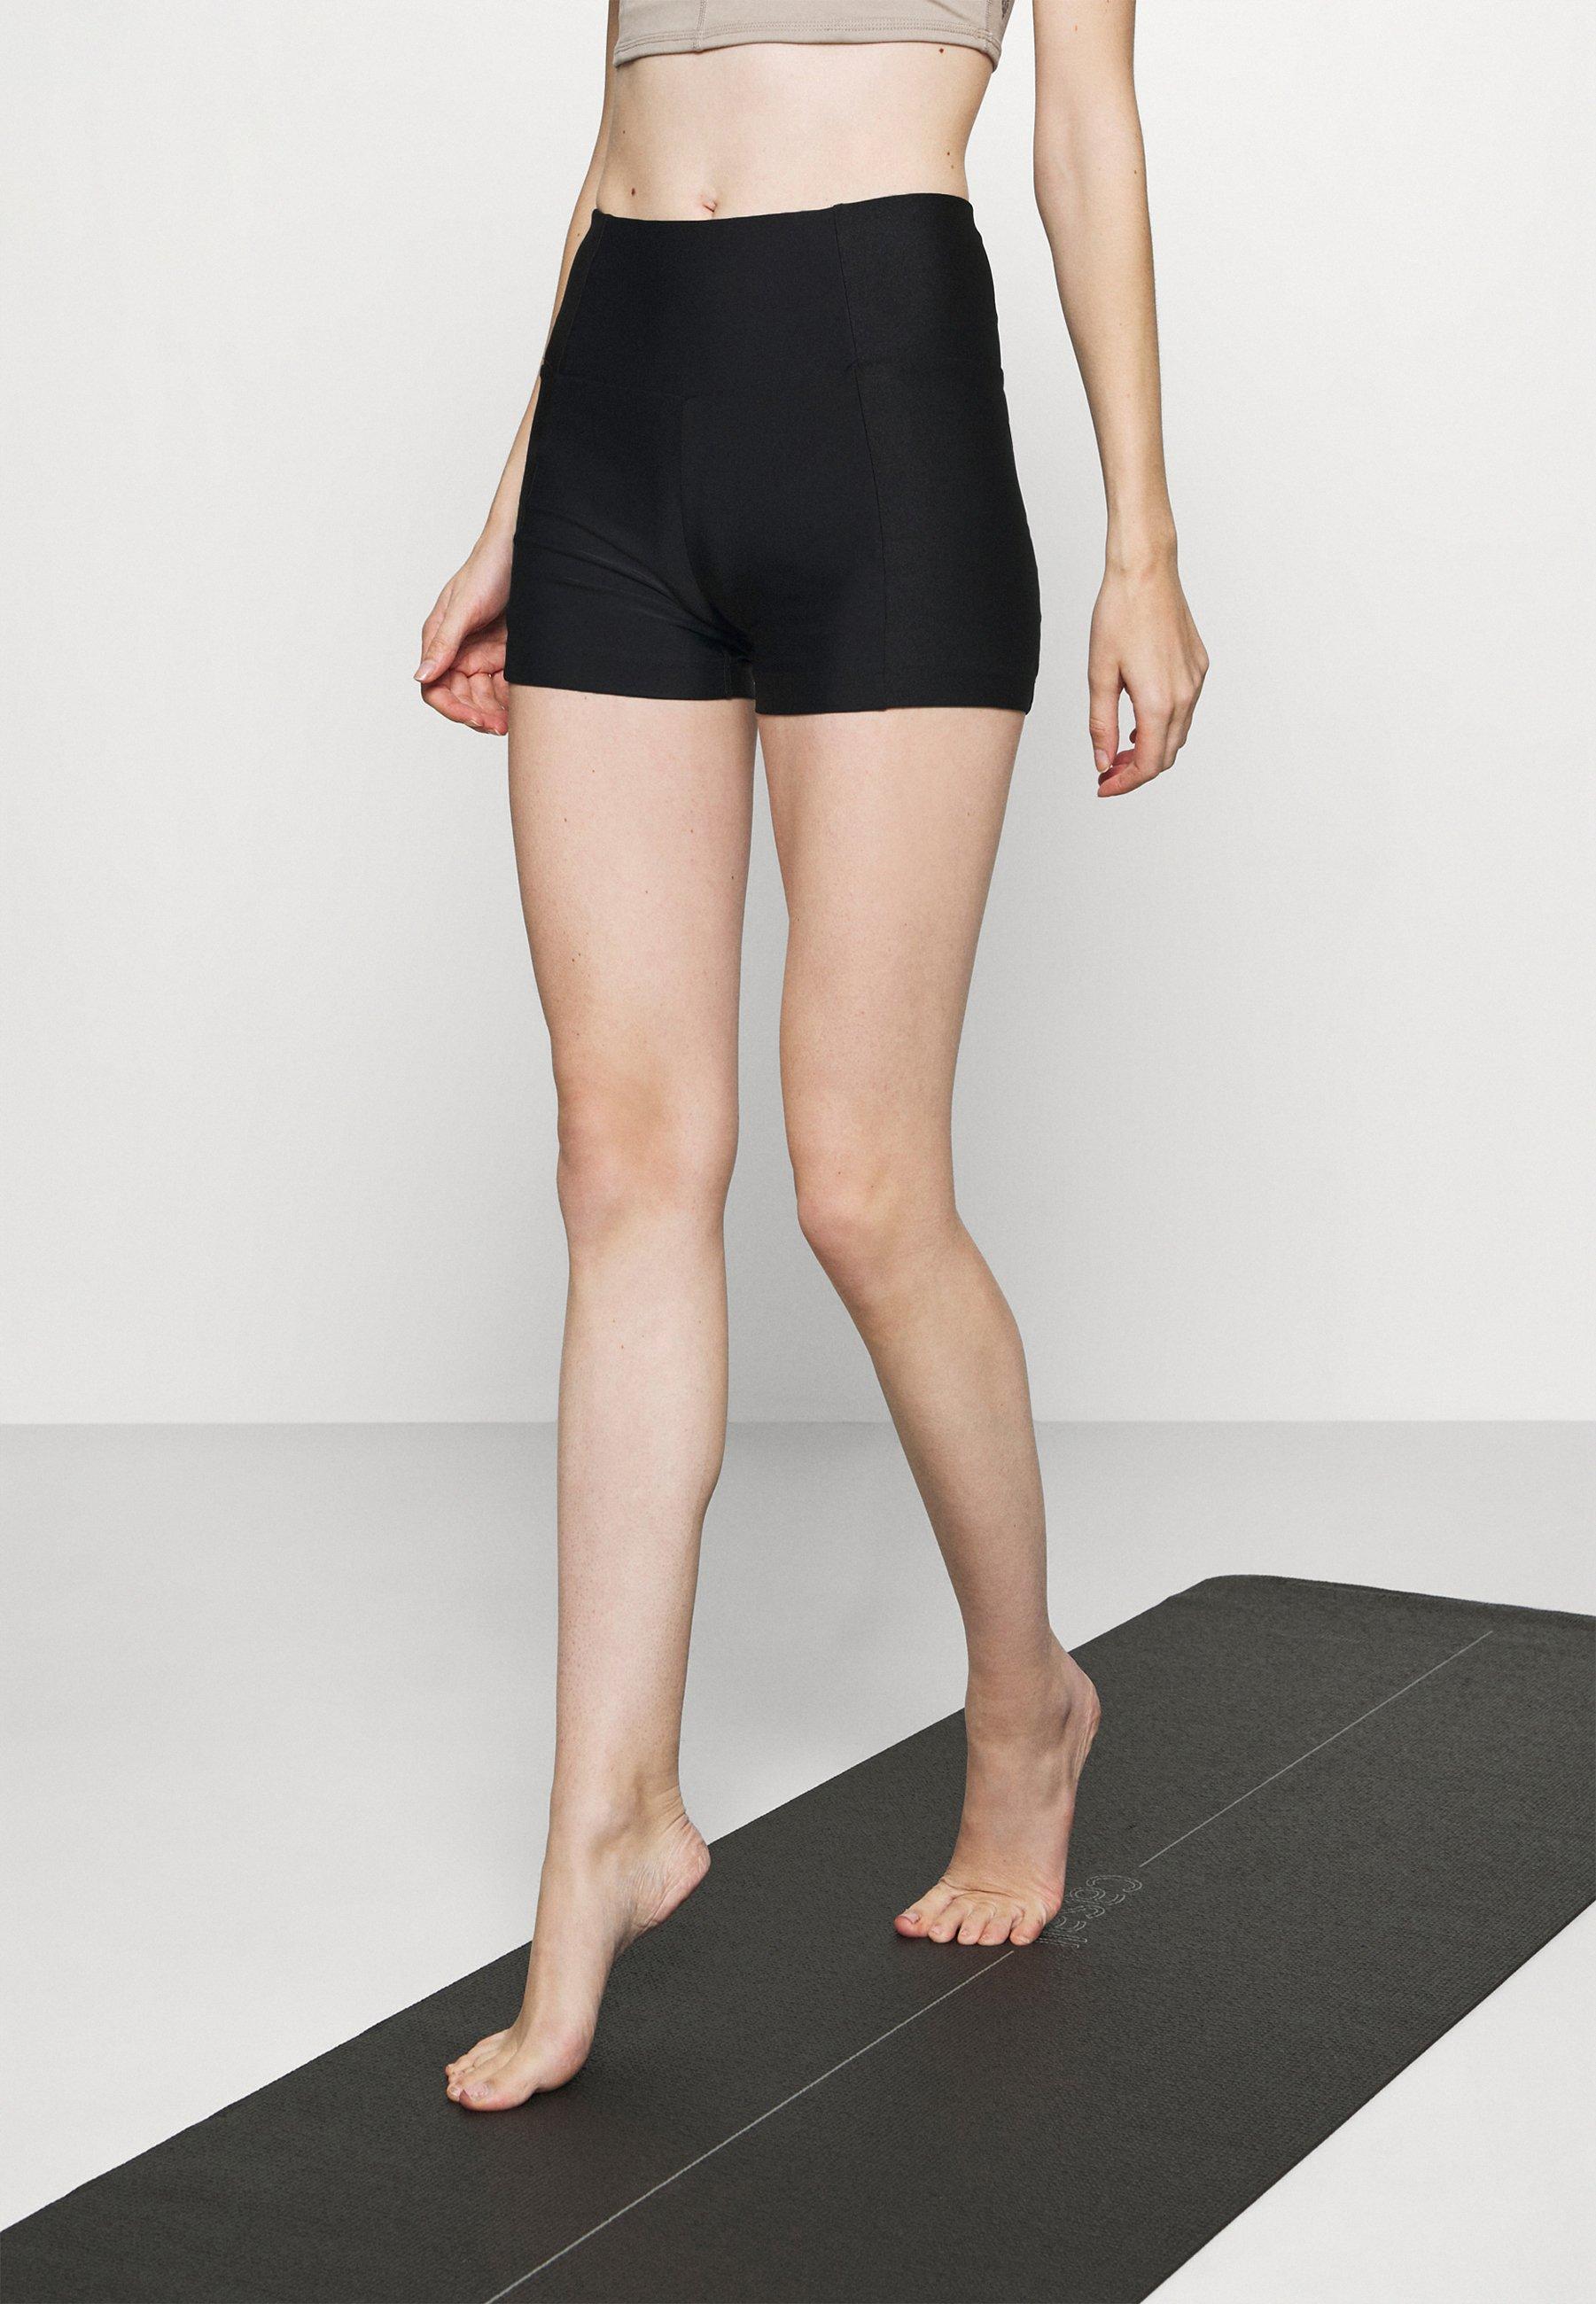 Femme SHINE ON - Collants